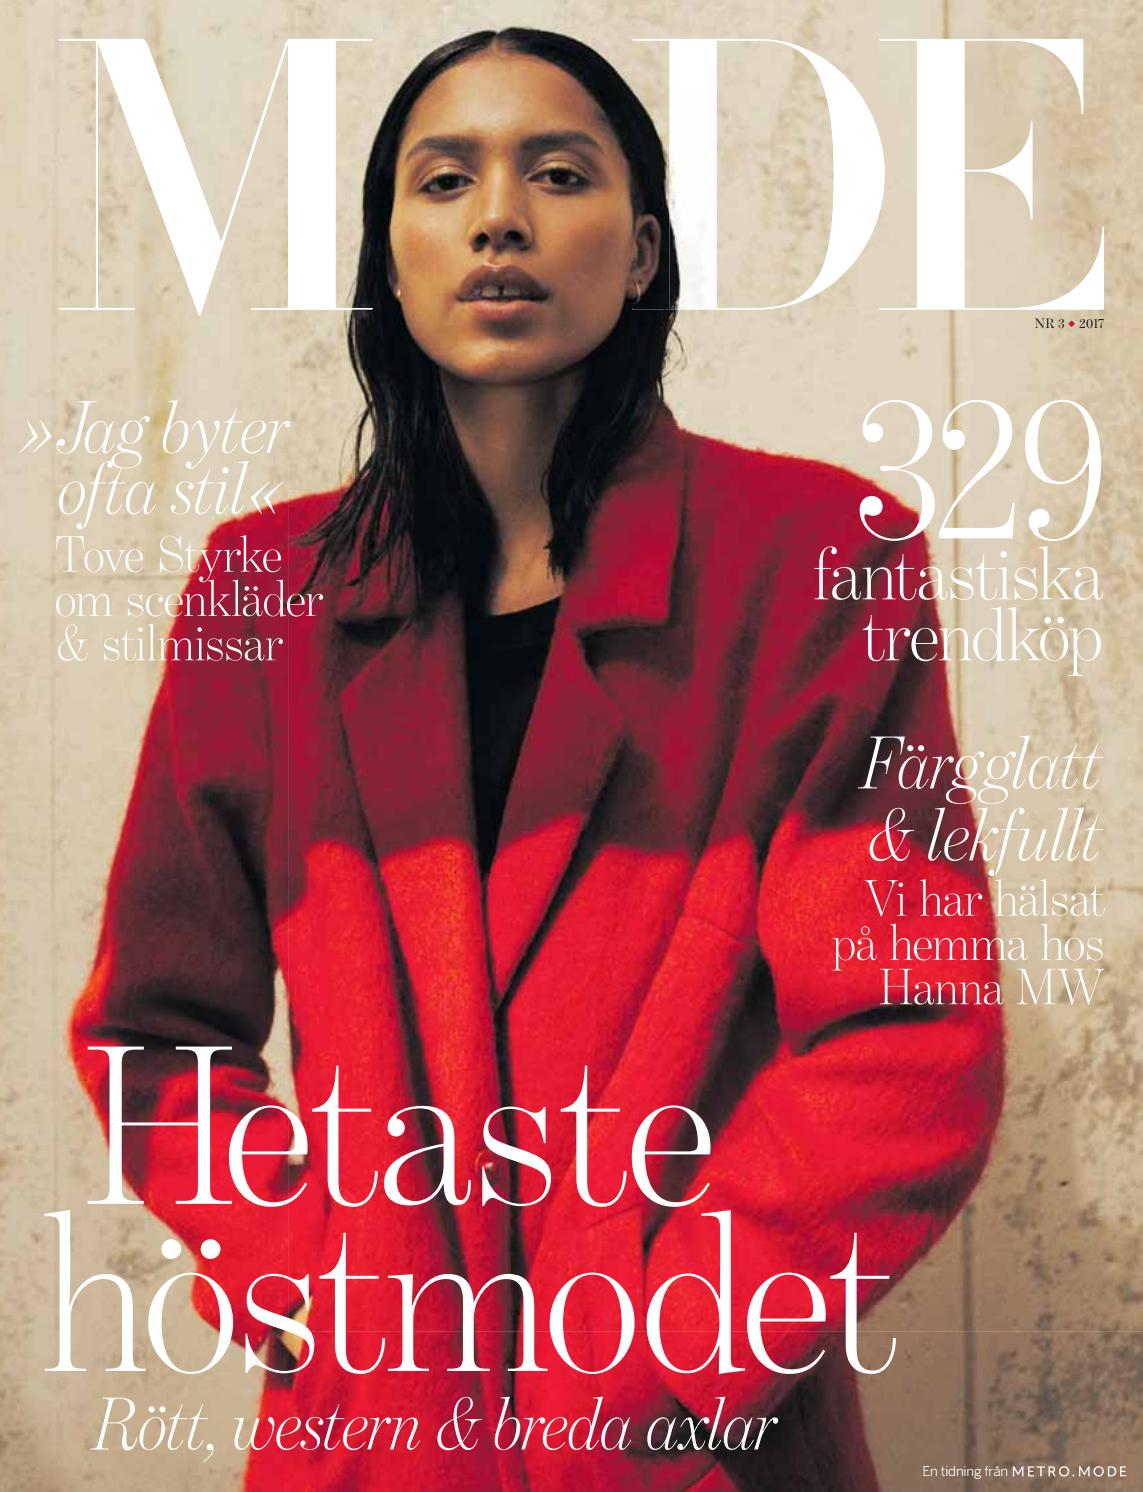 Metromode Nr 3 2017 by Metro Mode - issuu 3b5f853343fe0